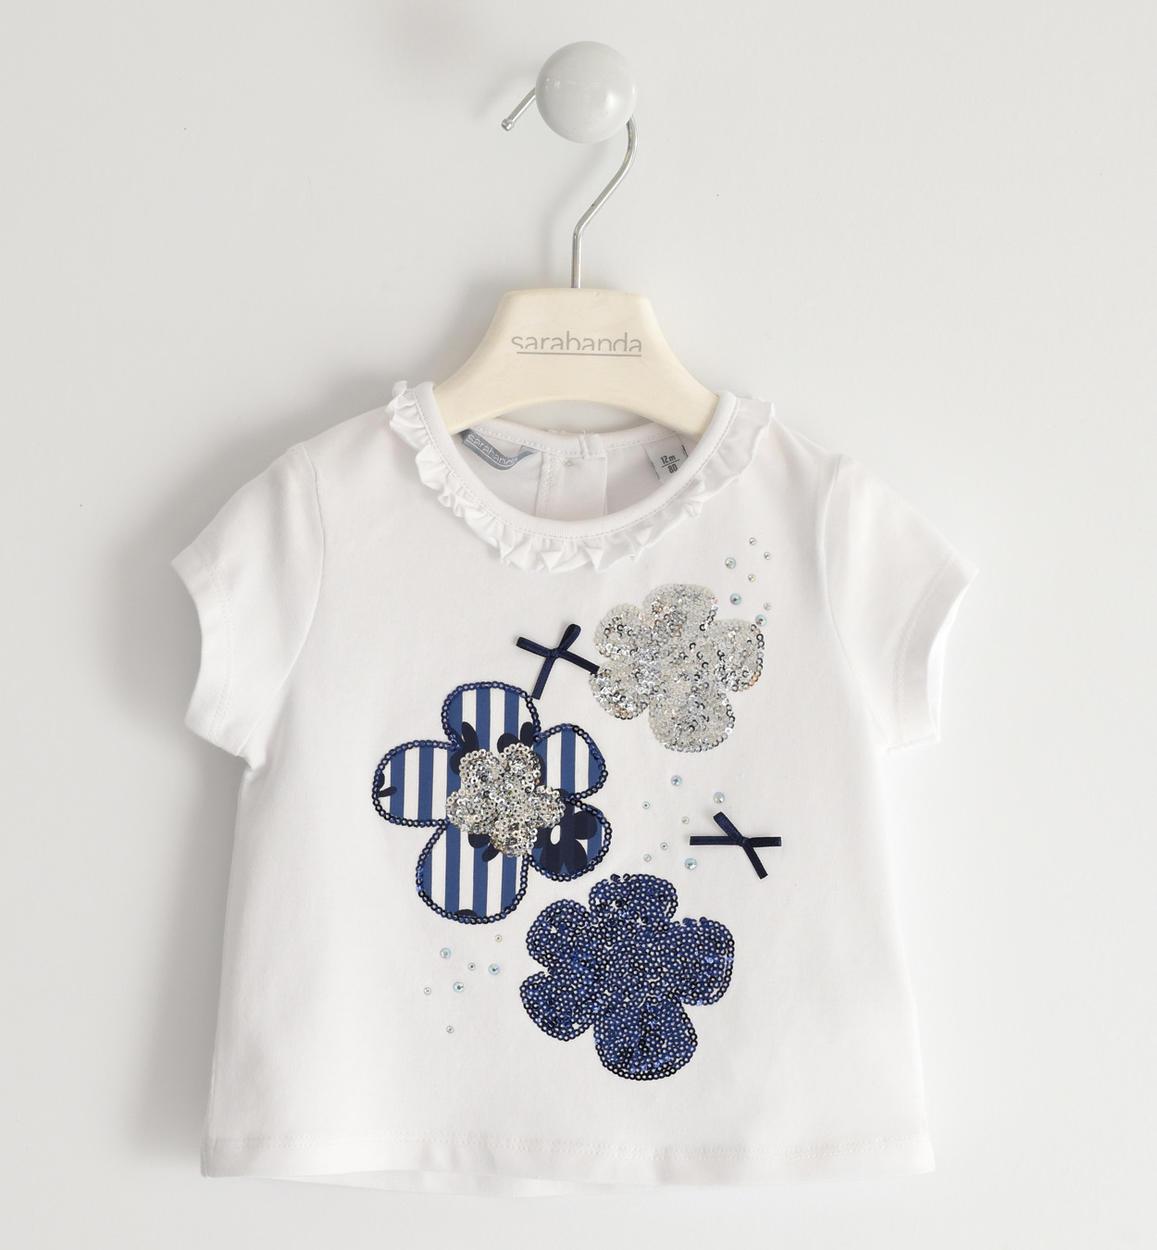 Sarabanda kék virágos pamut fehér póló